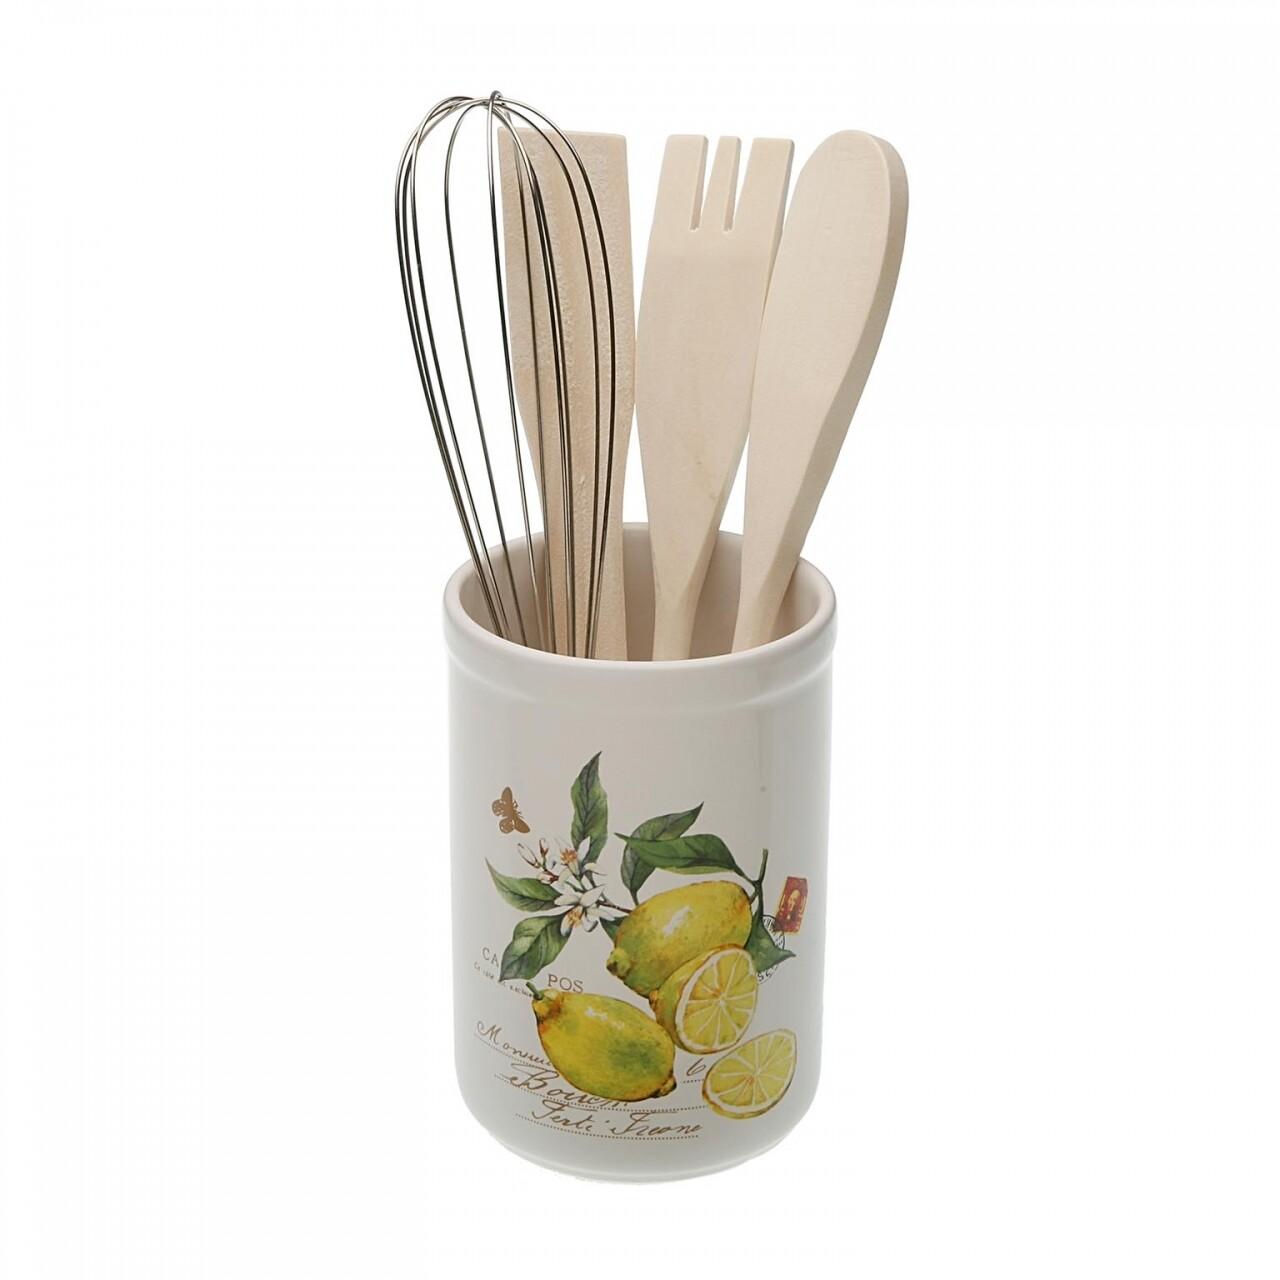 Suport cu ustensile Lemons, Versa, 10 x 10 x 15 cm, lemn/ceramica, multicolor